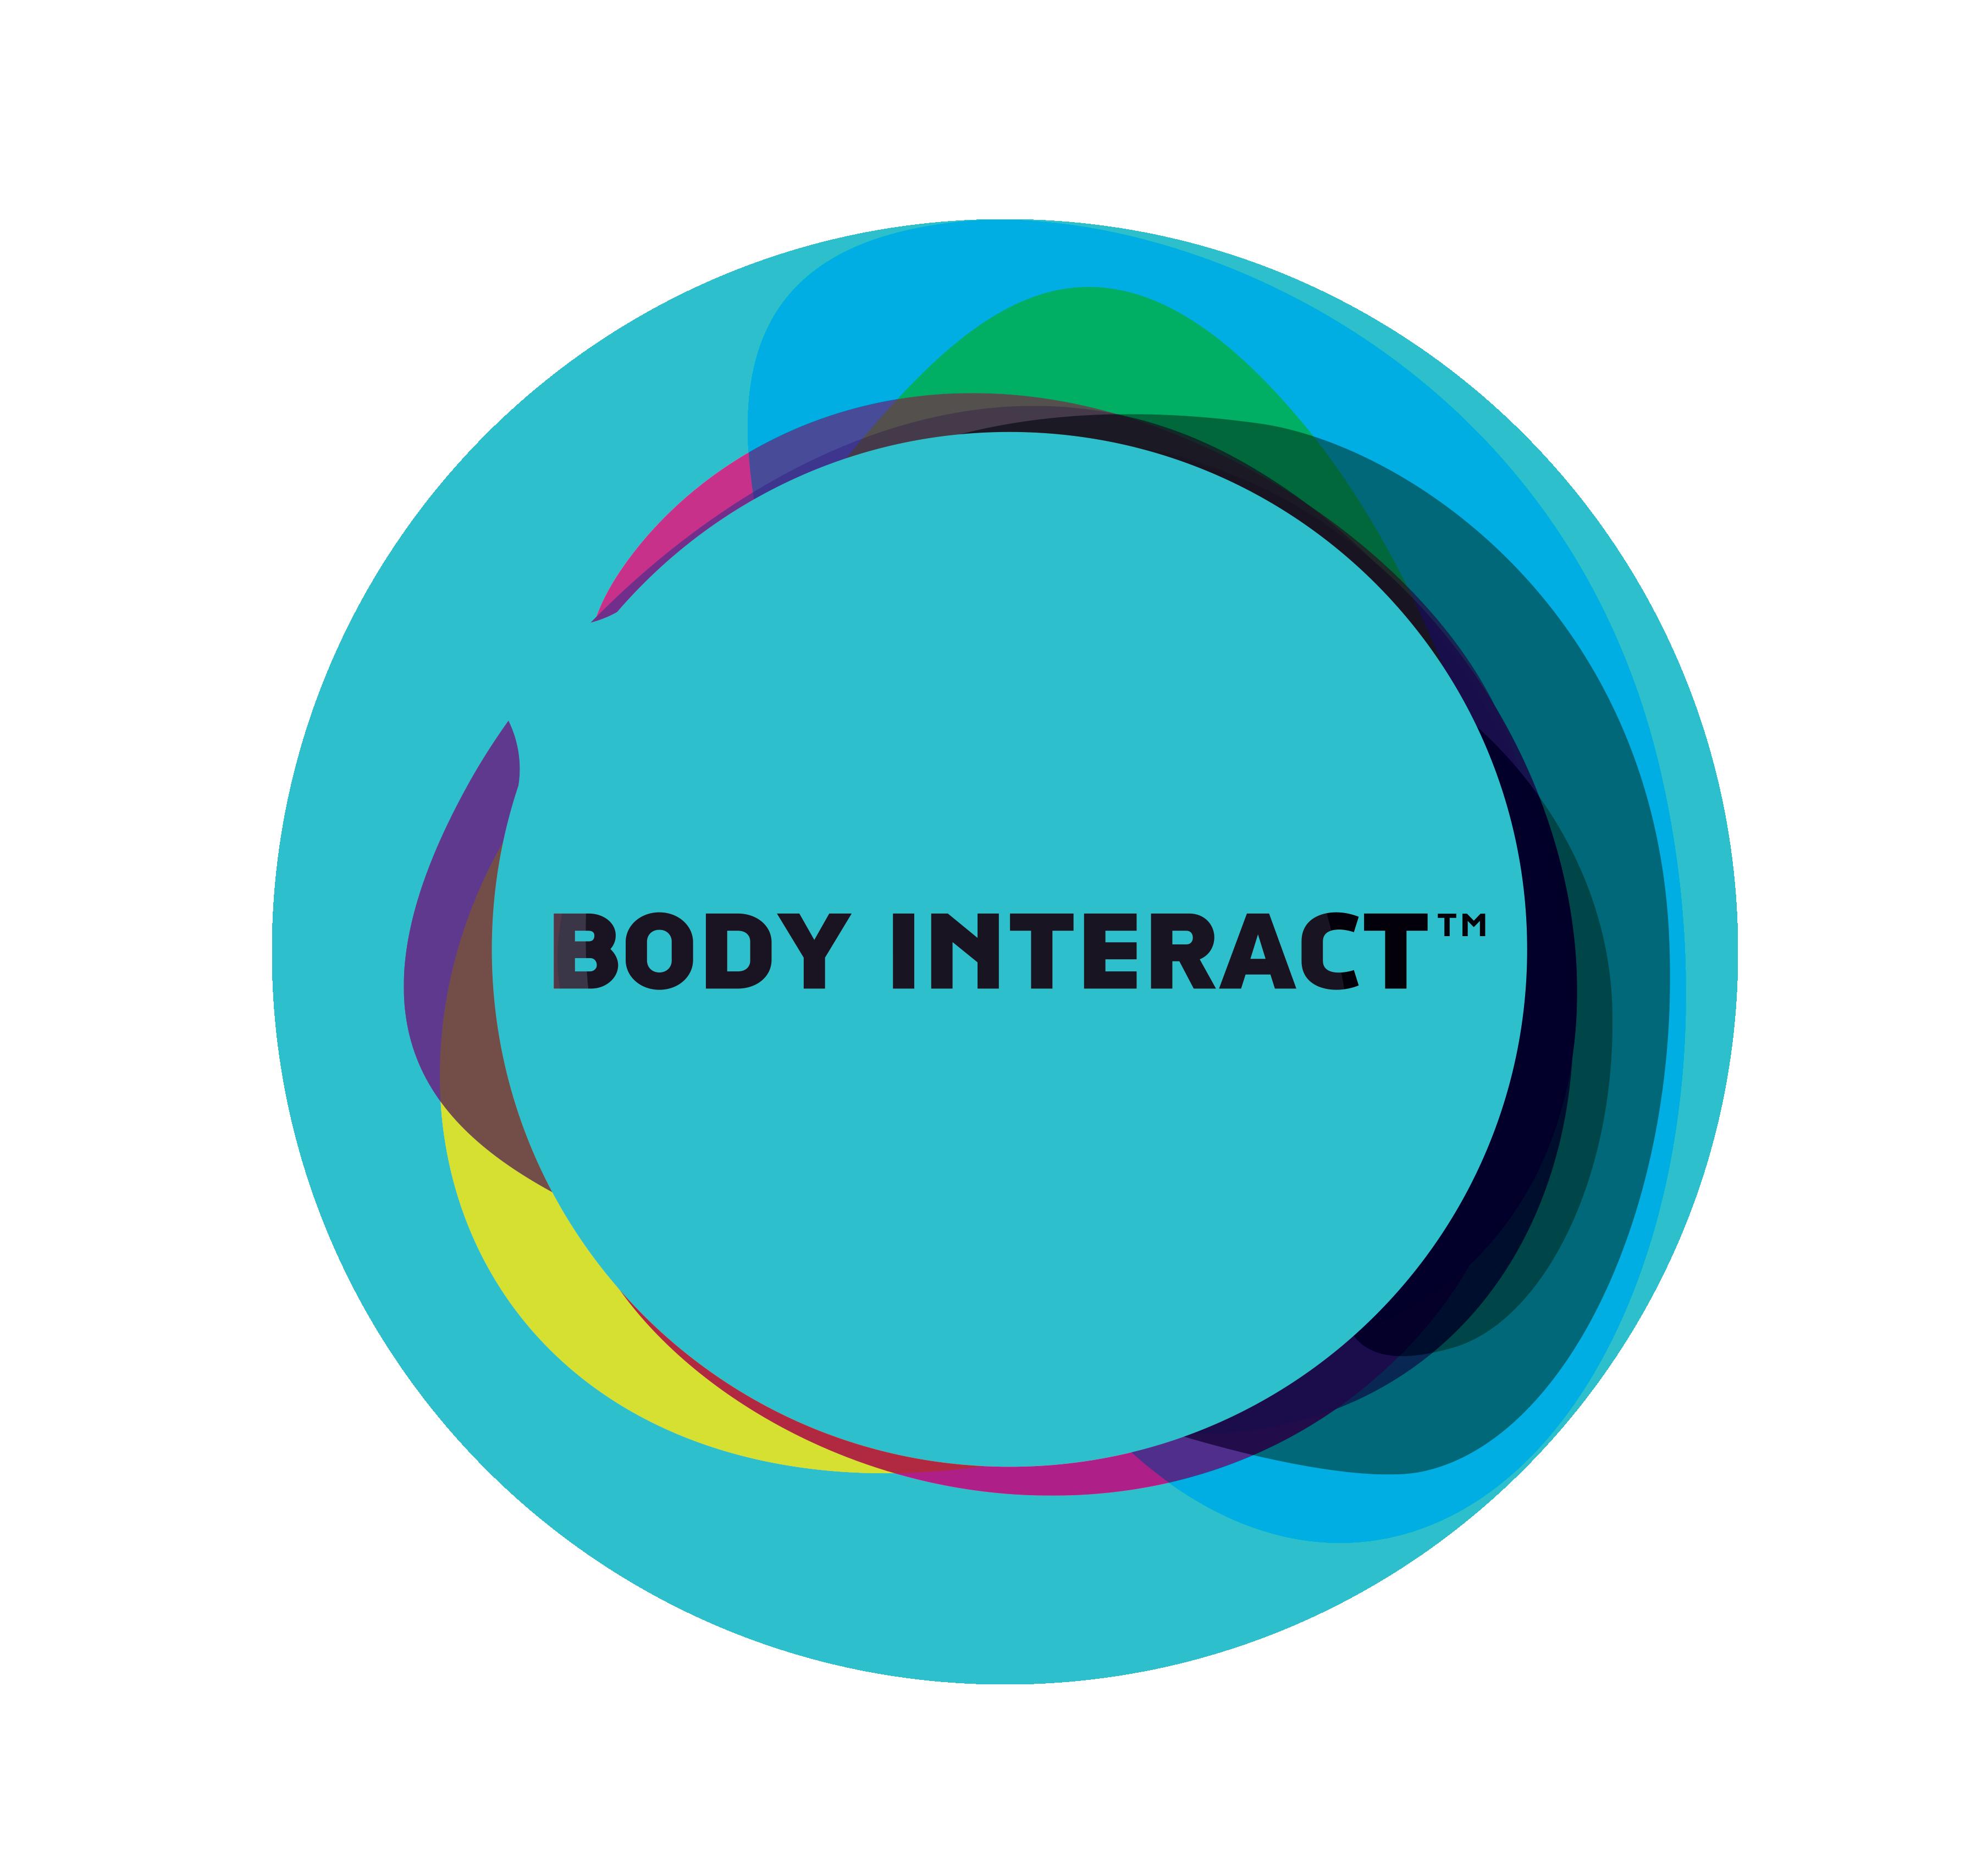 logo body interact 1